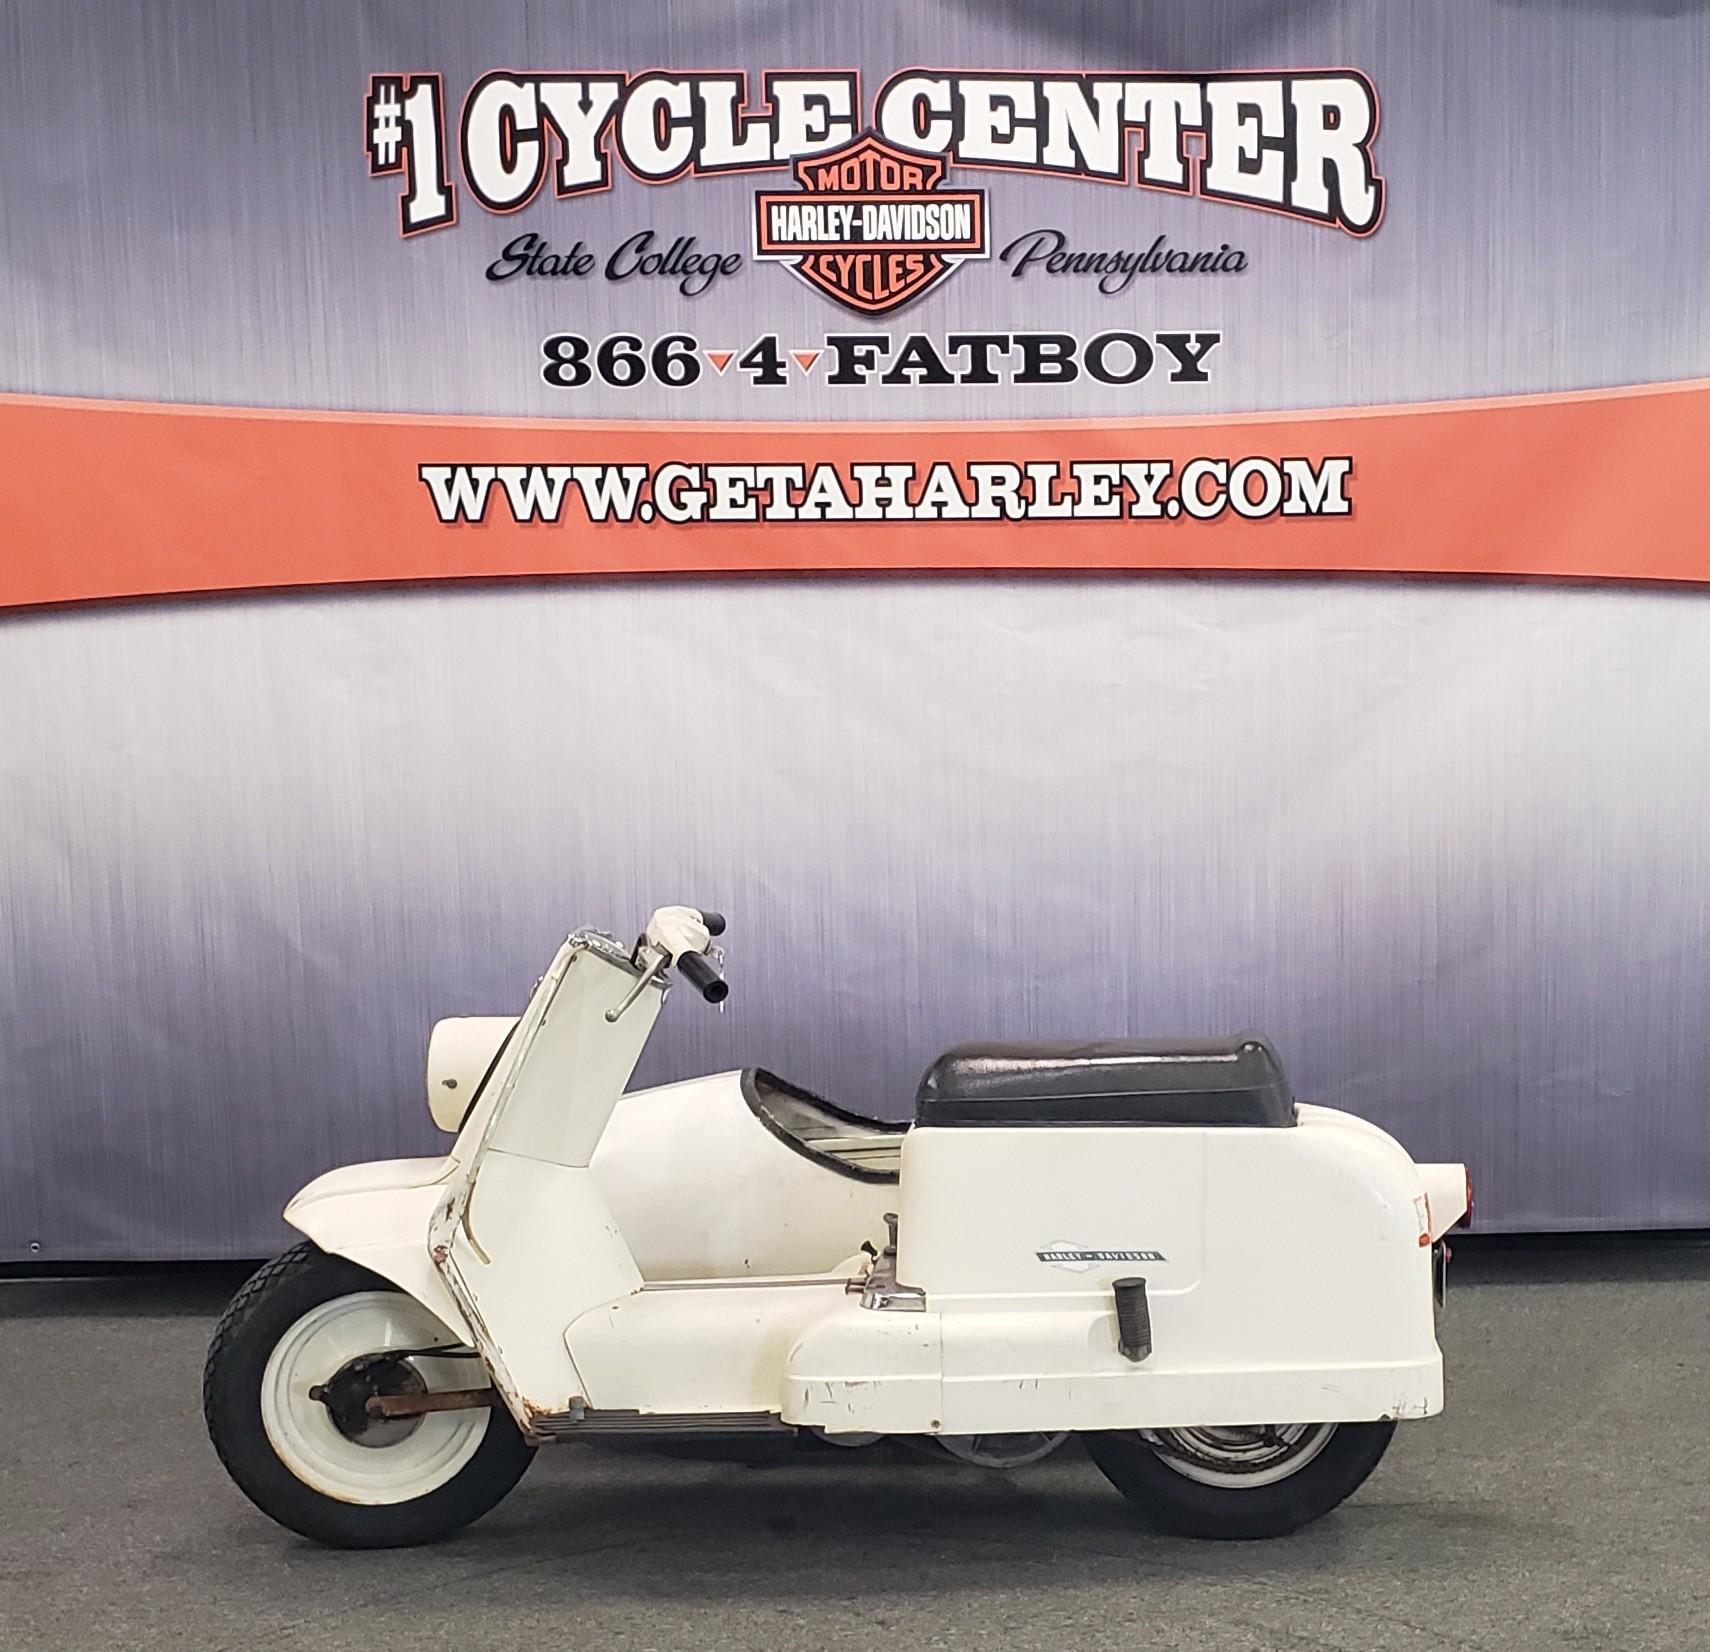 1965 Harley-Davidson TOPPER W SIDECAR at #1 Cycle Center Harley-Davidson